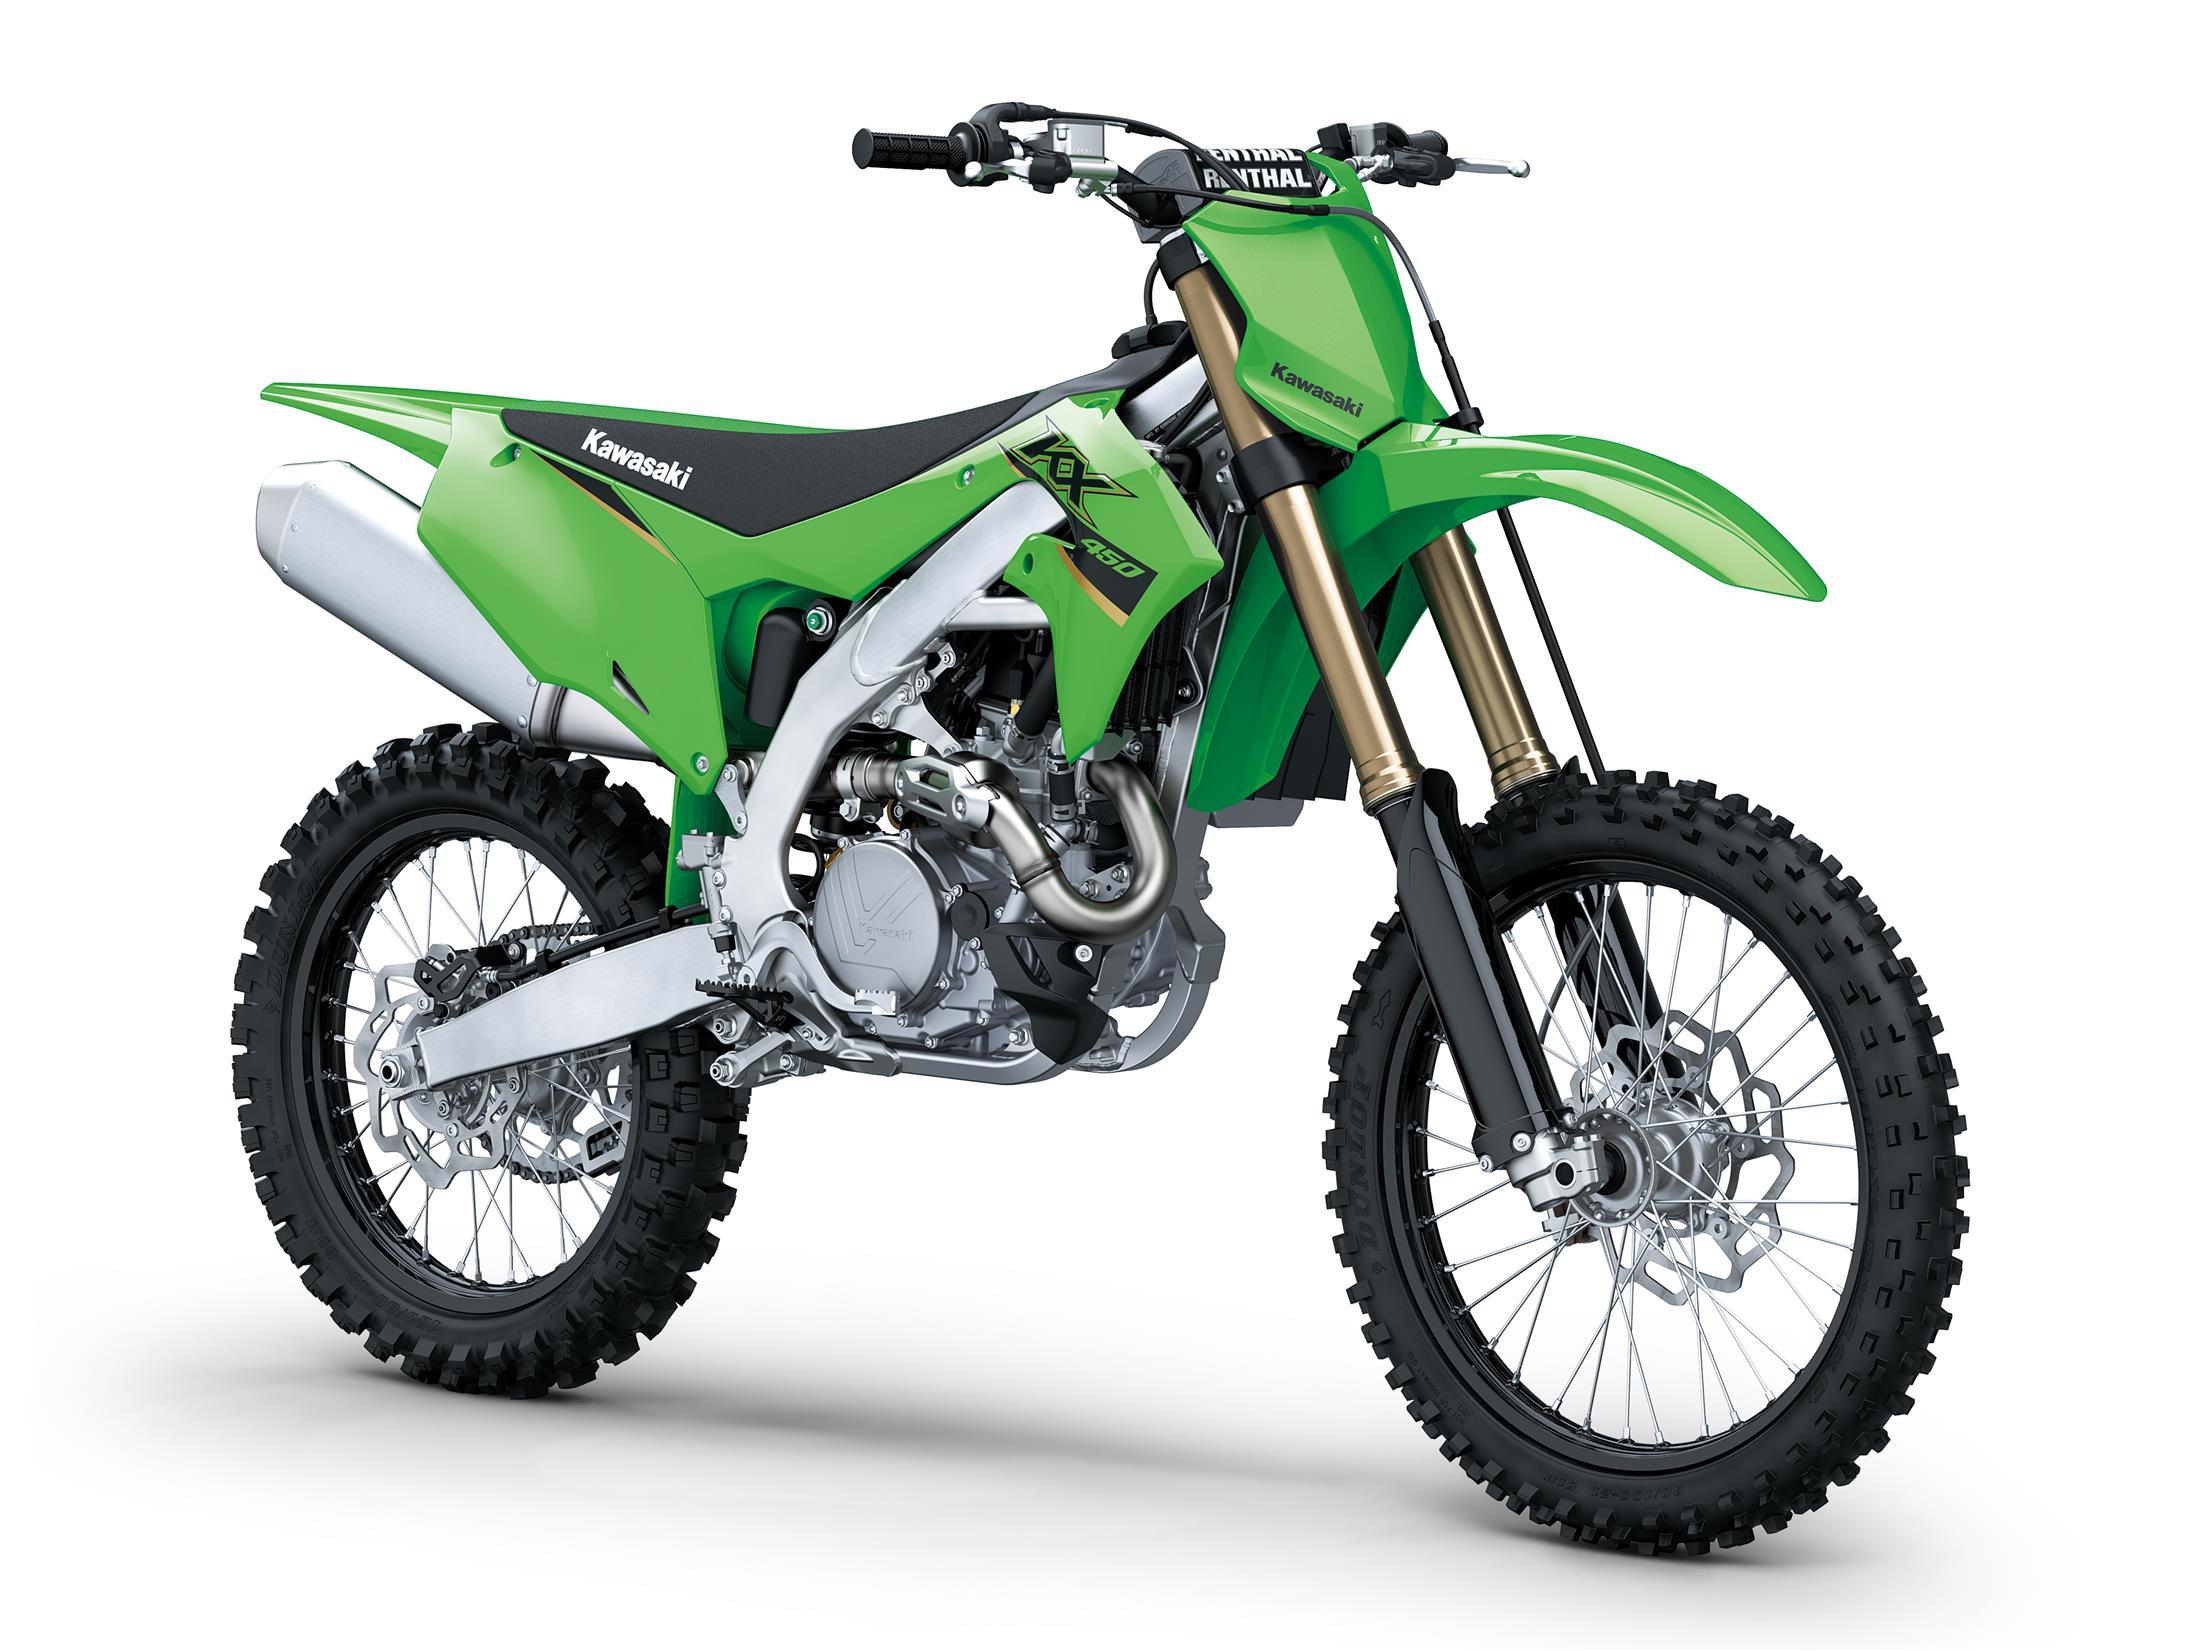 2022 KX450